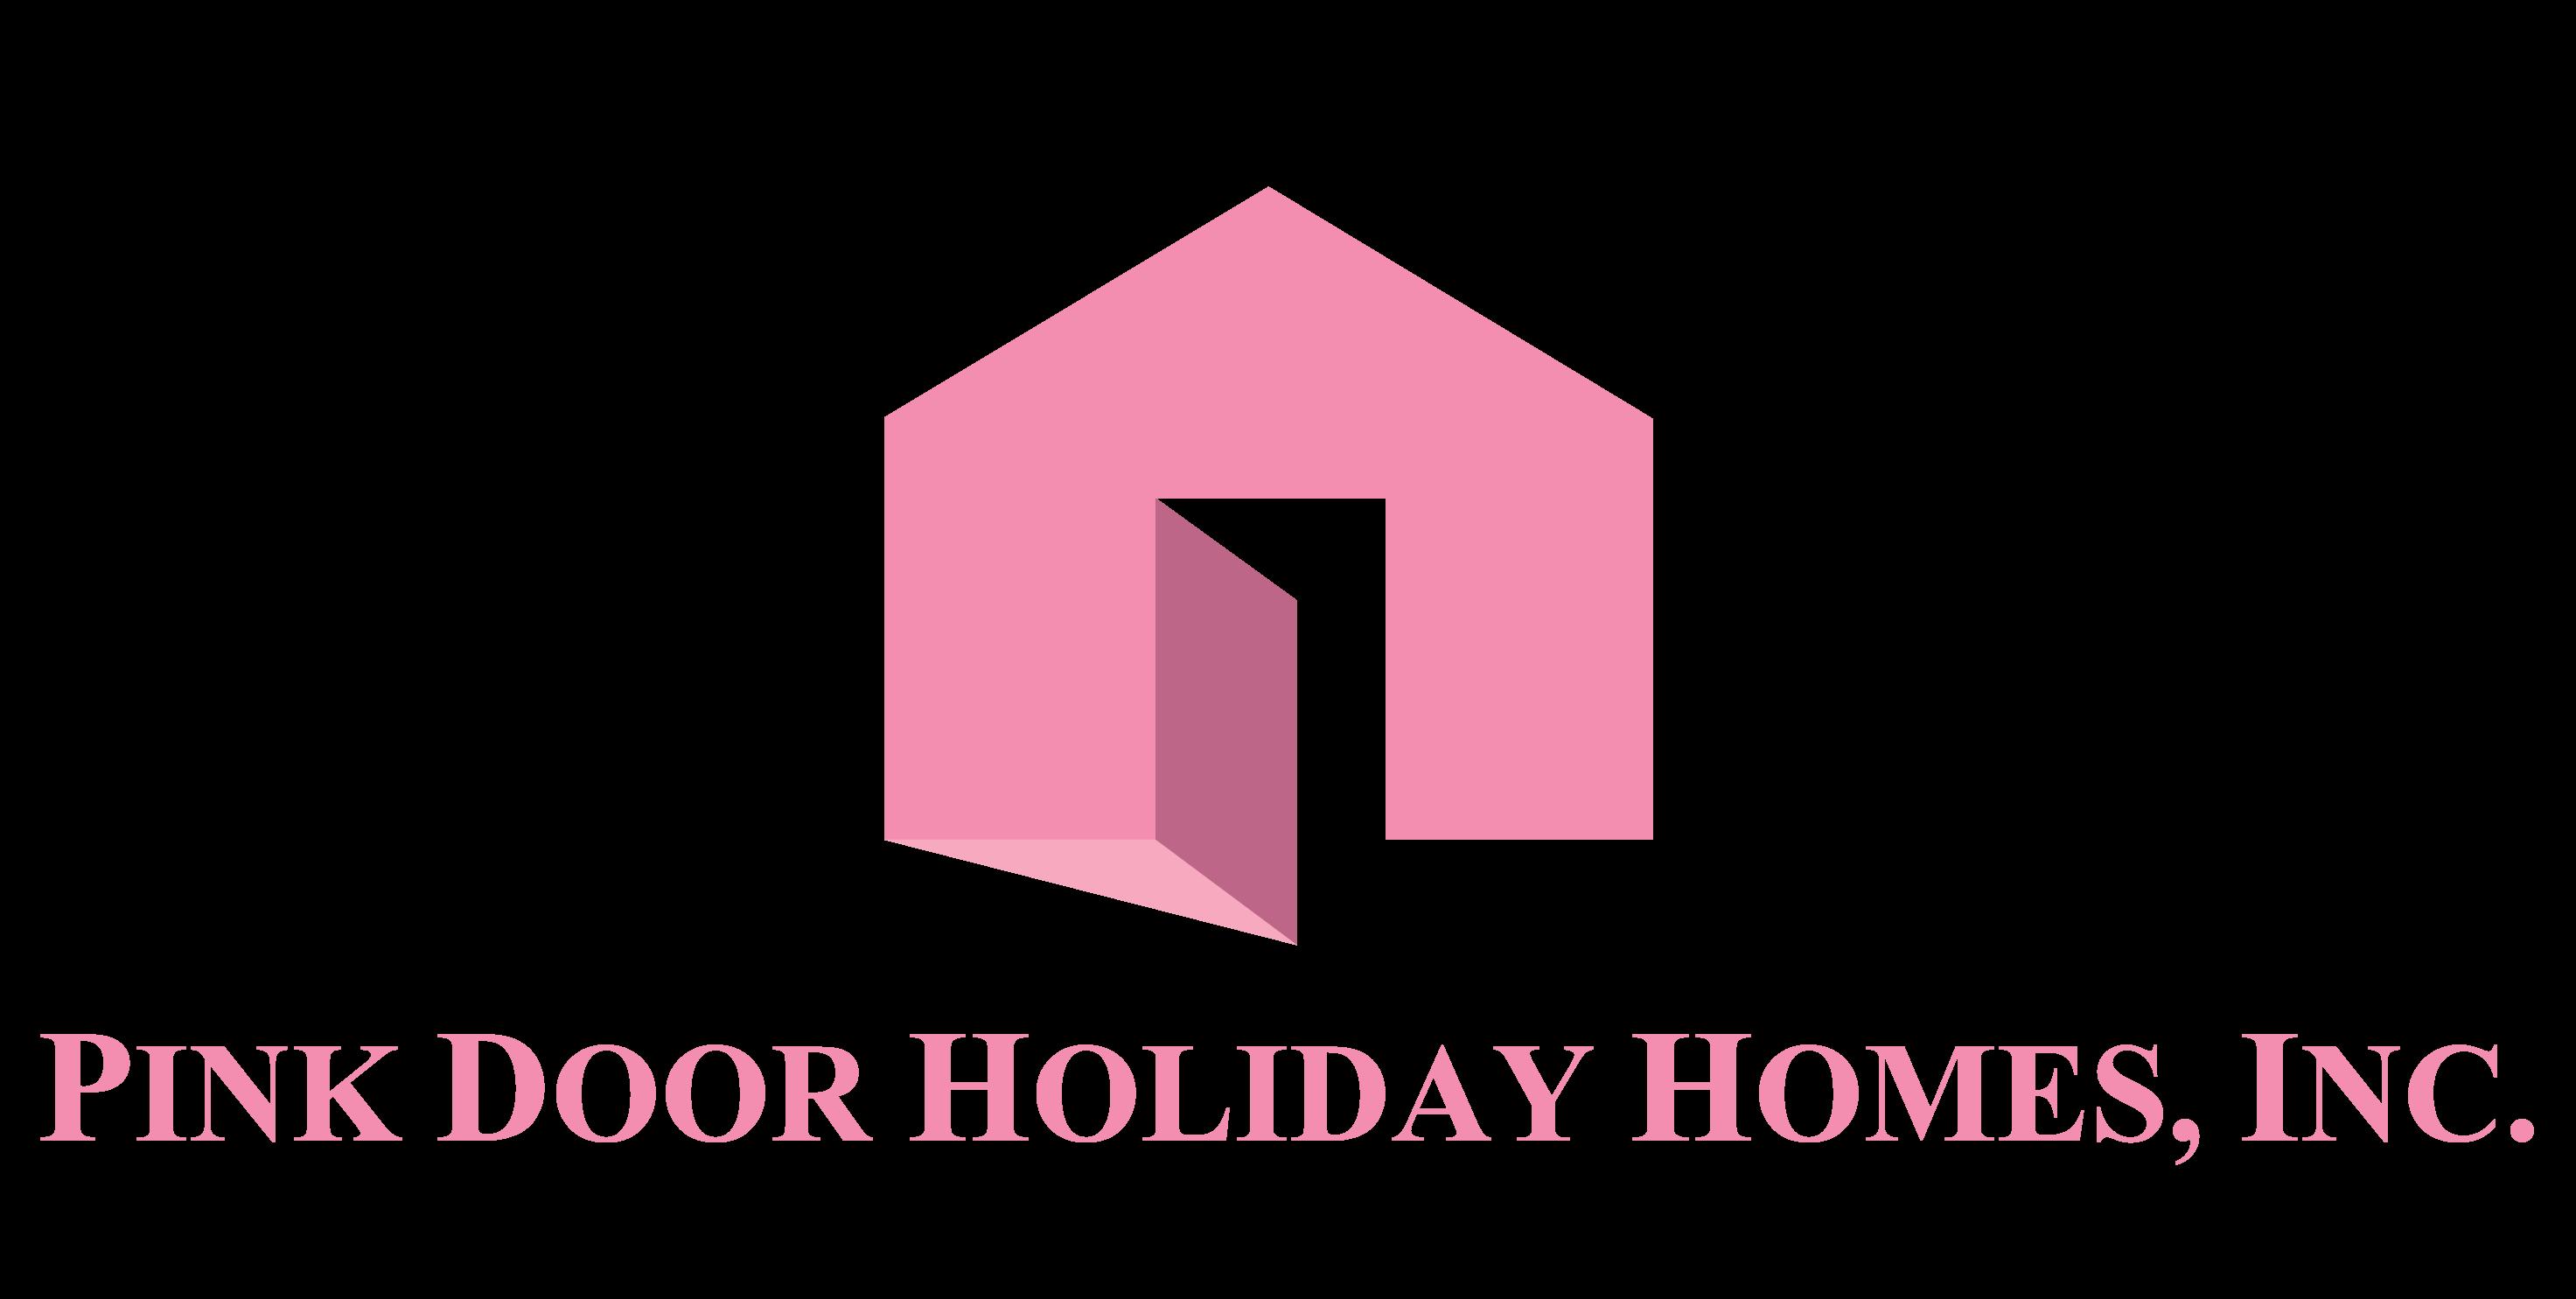 Pink Door Holiday Homes Logo